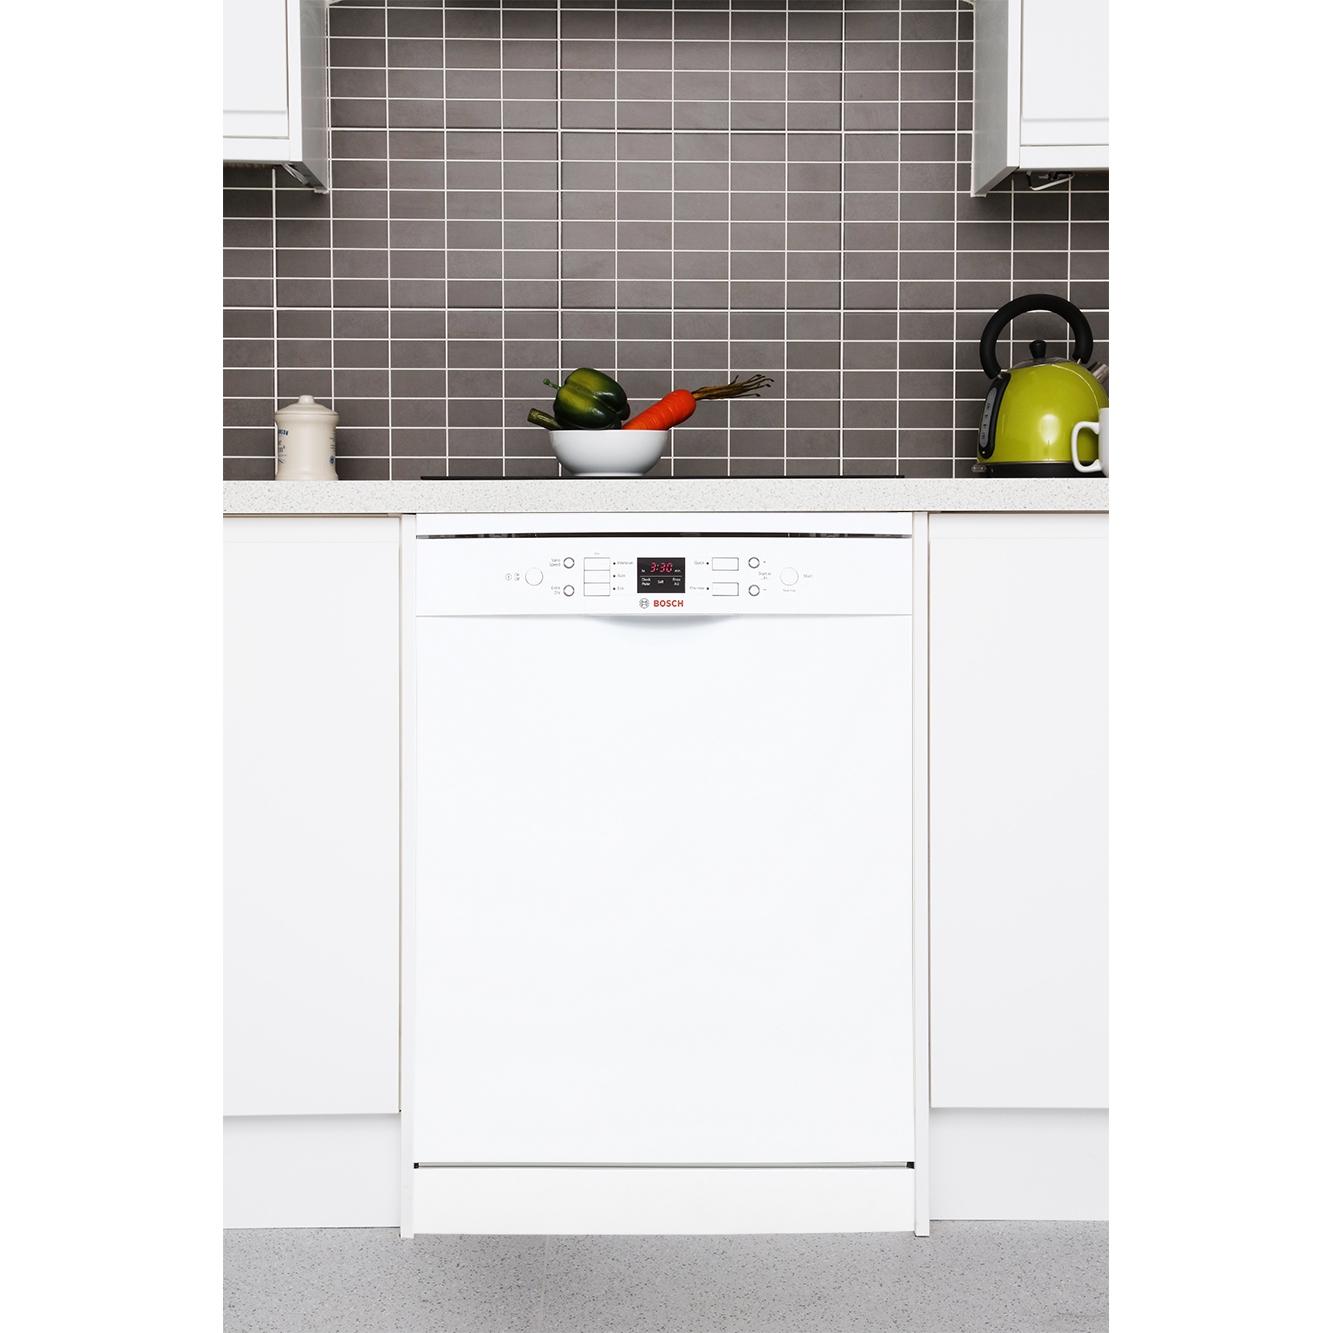 Miniature Dishwasher Buy Bosch Series 6 Sms58m32gb Dishwasher Sms58m32gb White